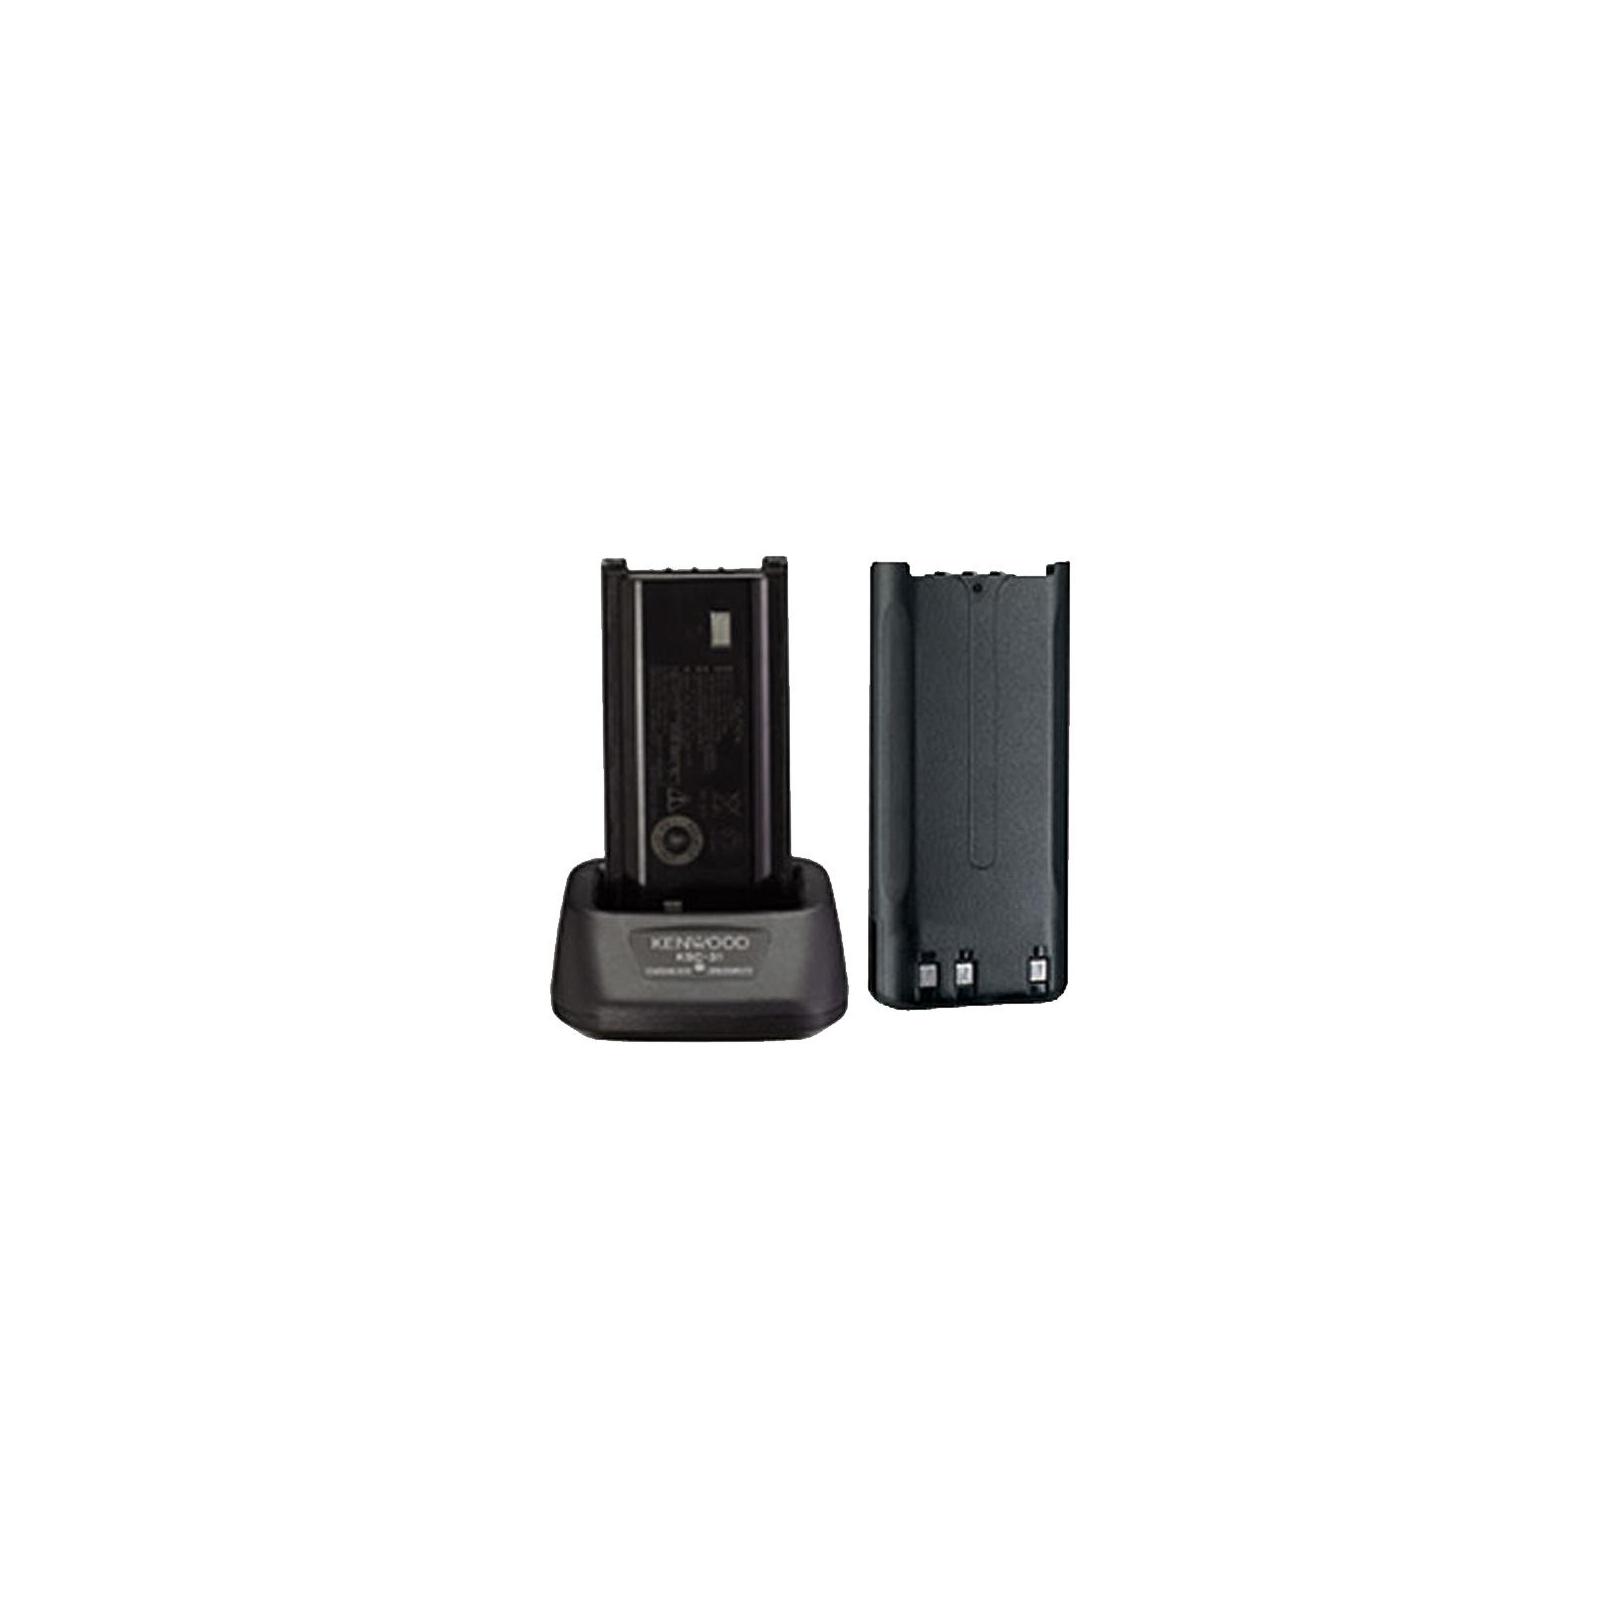 Аккумуляторная батарея для телефона Kenwood для ТК-2206/3206/2306/2212/2307 (KNB-30N) изображение 2